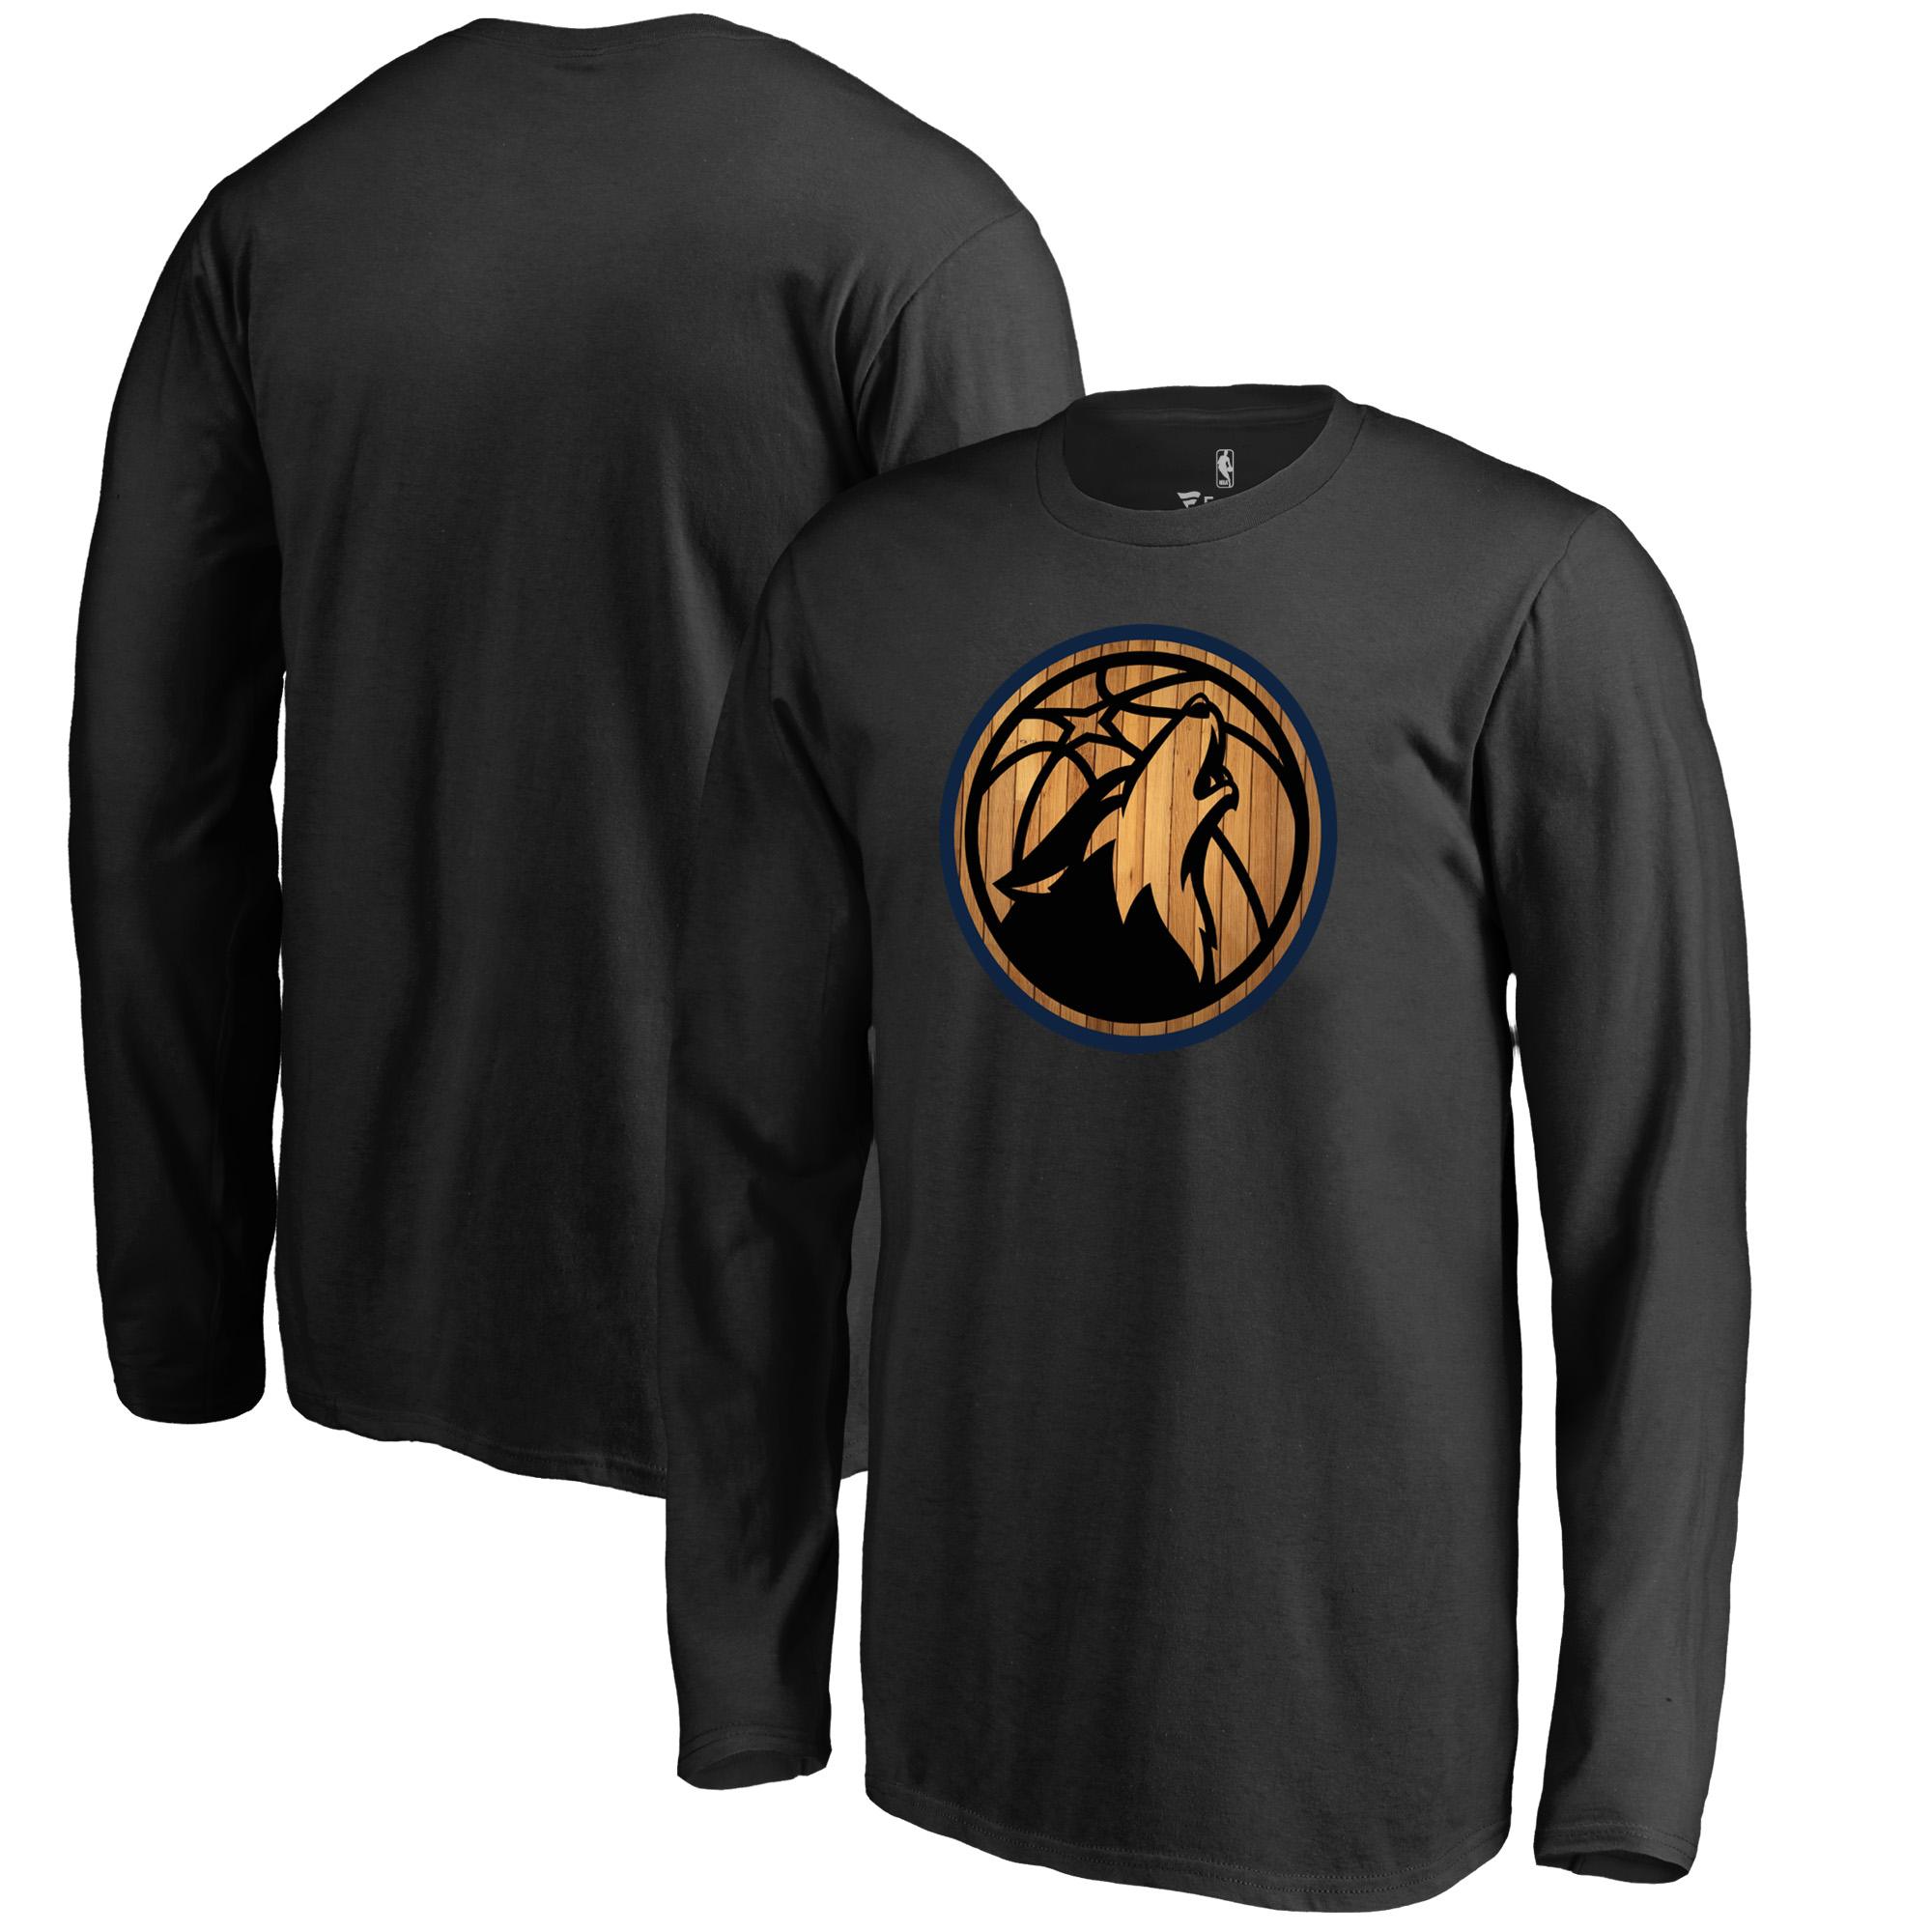 Minnesota Timberwolves Fanatics Branded Youth Hardwood Long Sleeve T-Shirt - Black